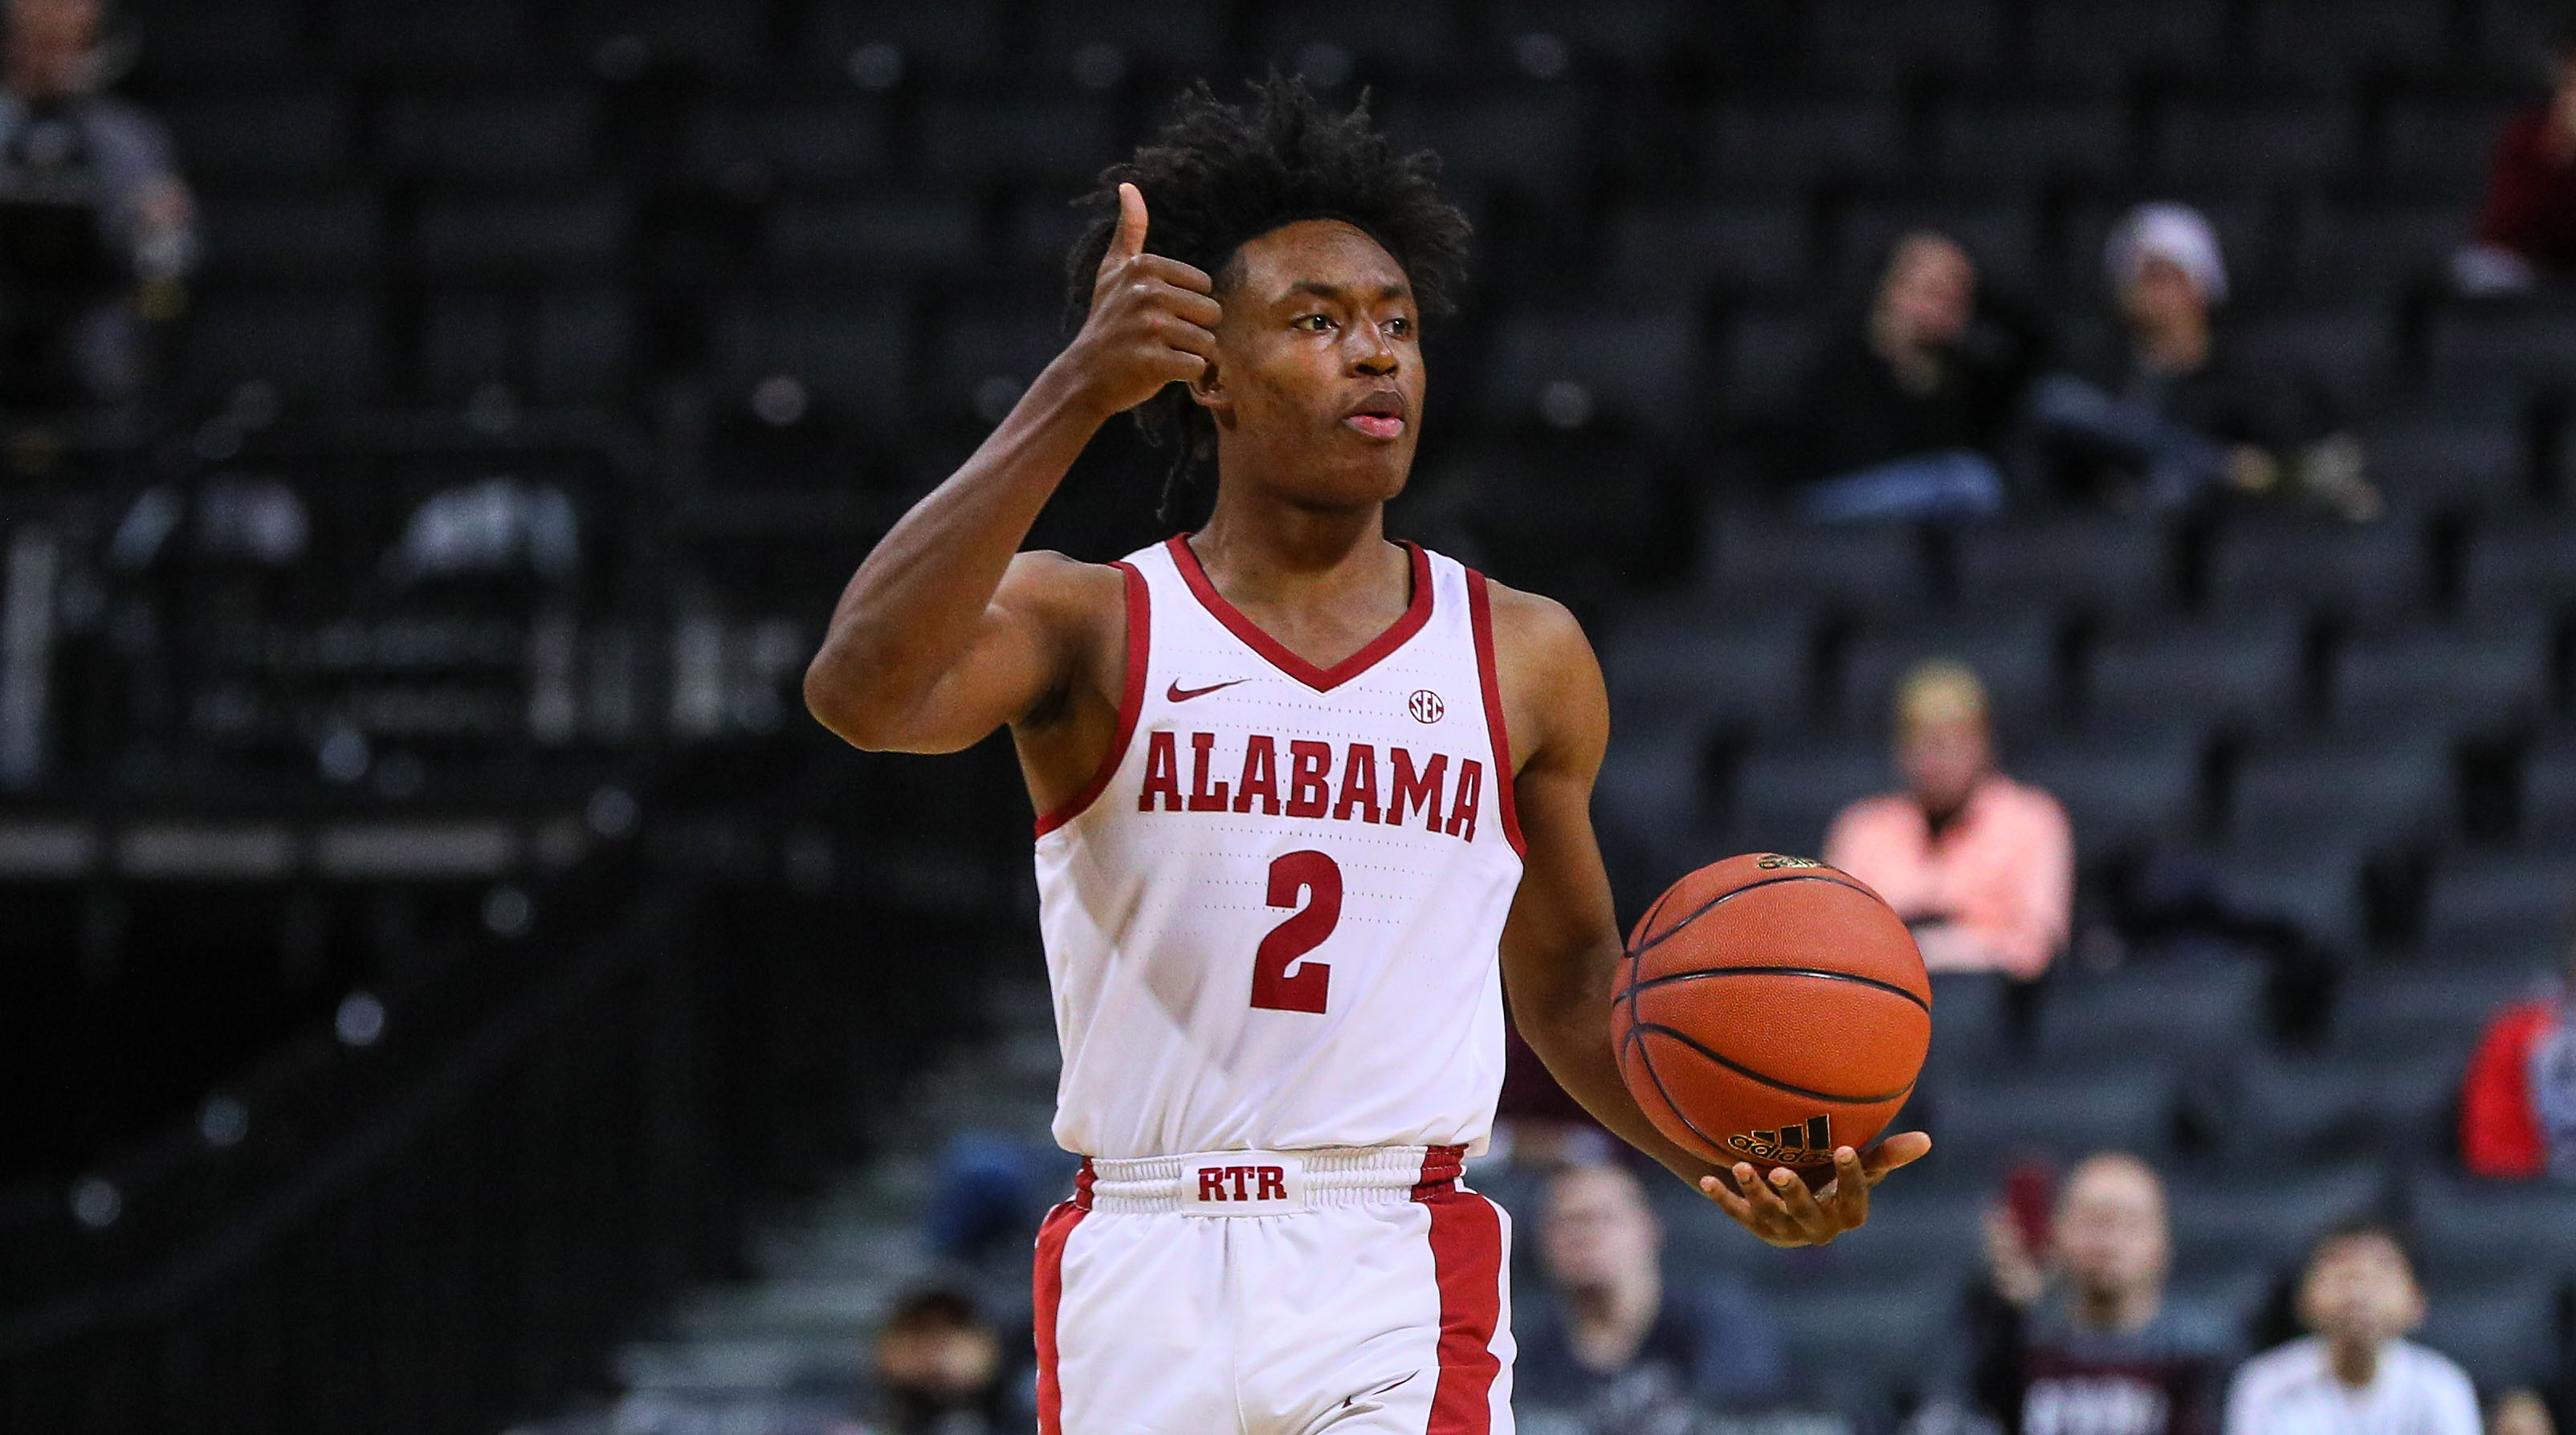 brand new ba2a3 92d05 Cavaliers pick Collin Sexton: 2018 NBA draft grades | SI.com